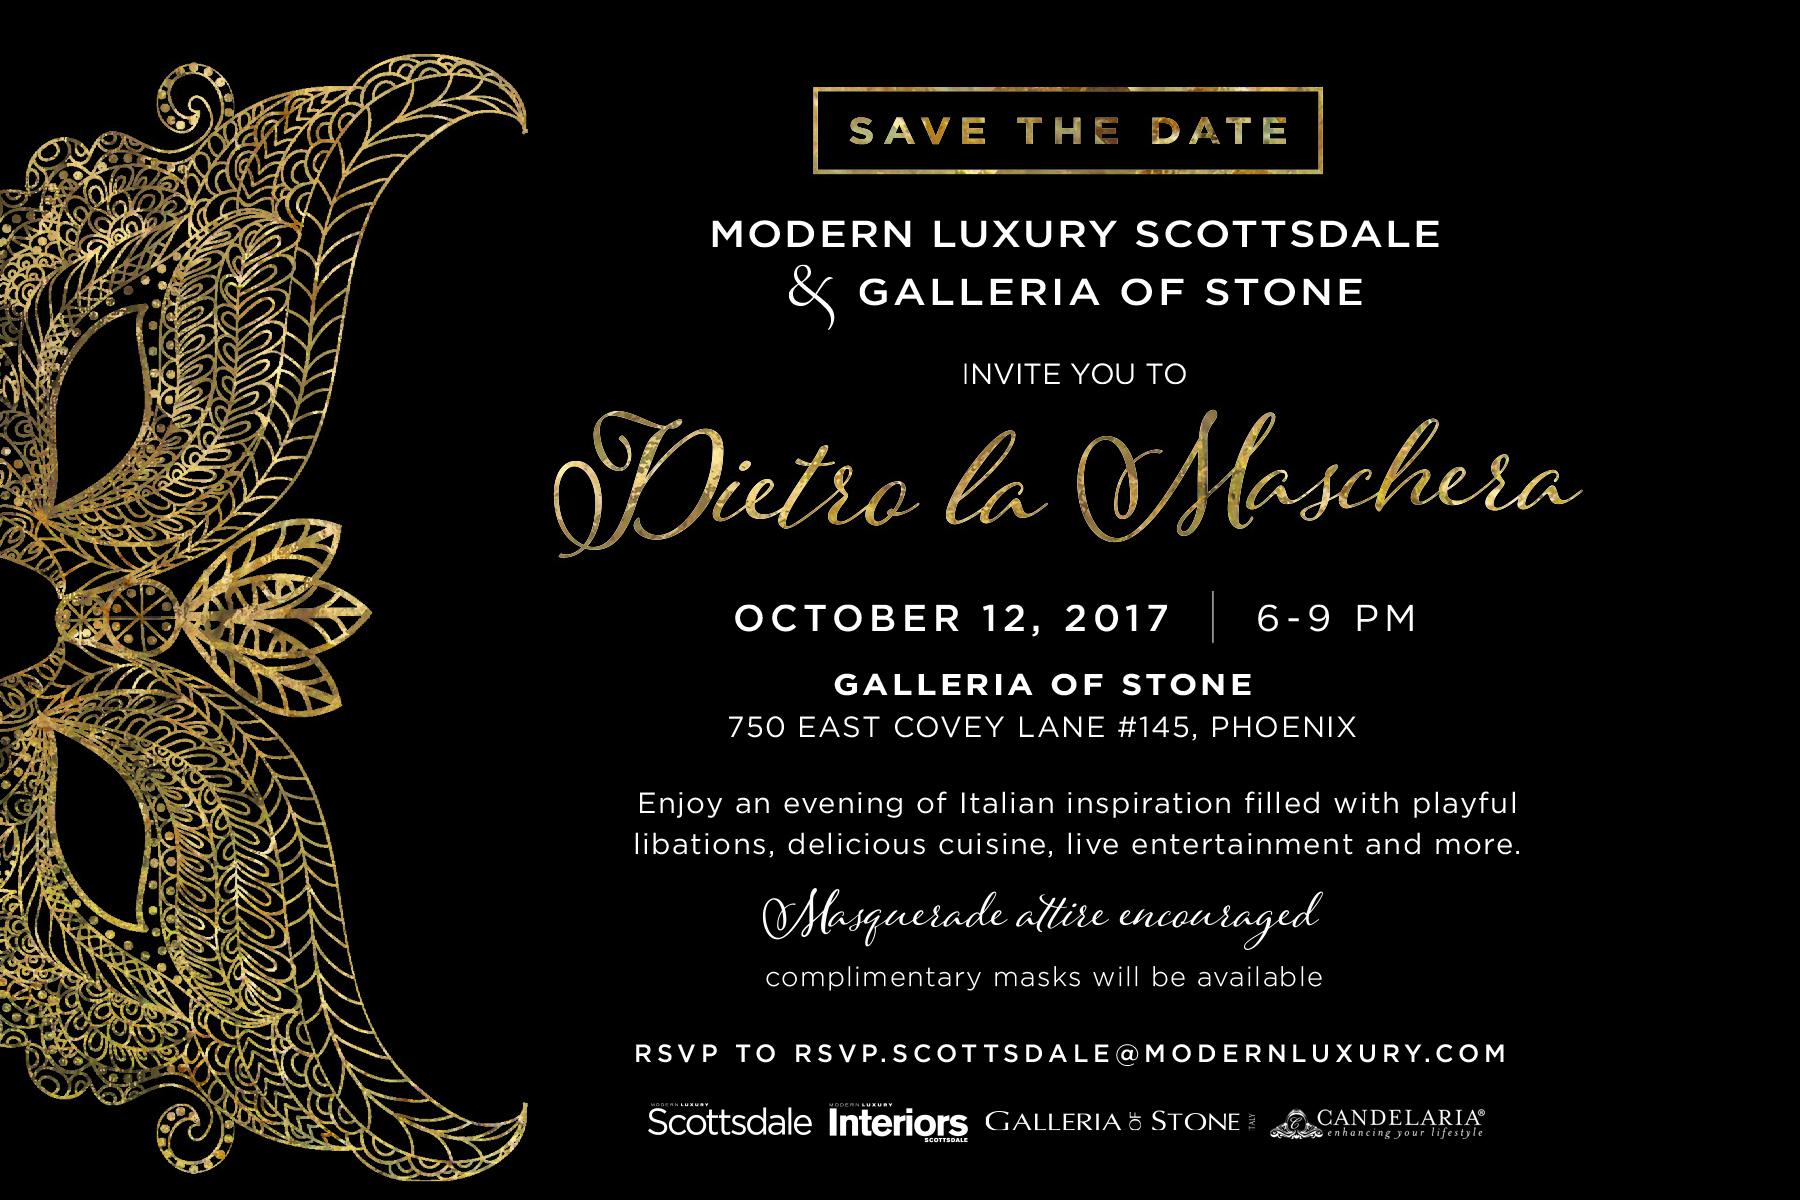 Save the Date. Galleria of Stone Invite.jpg